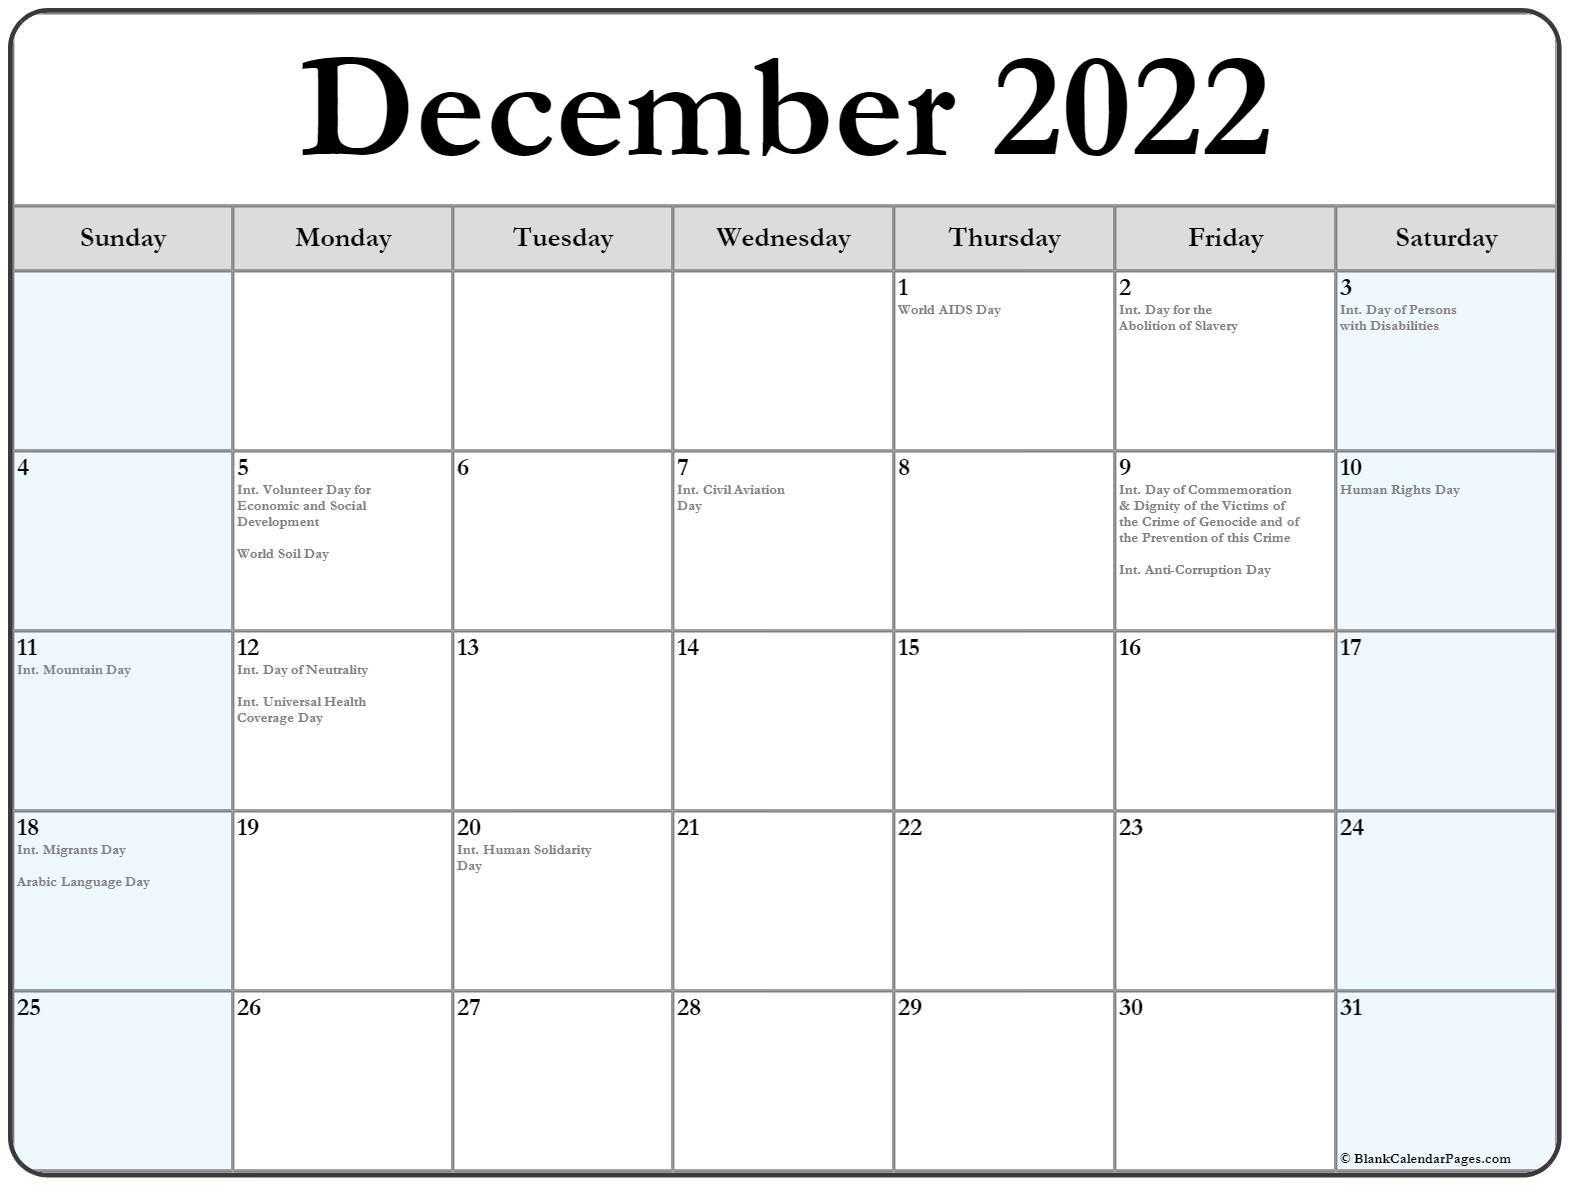 December 2019 with international holidays